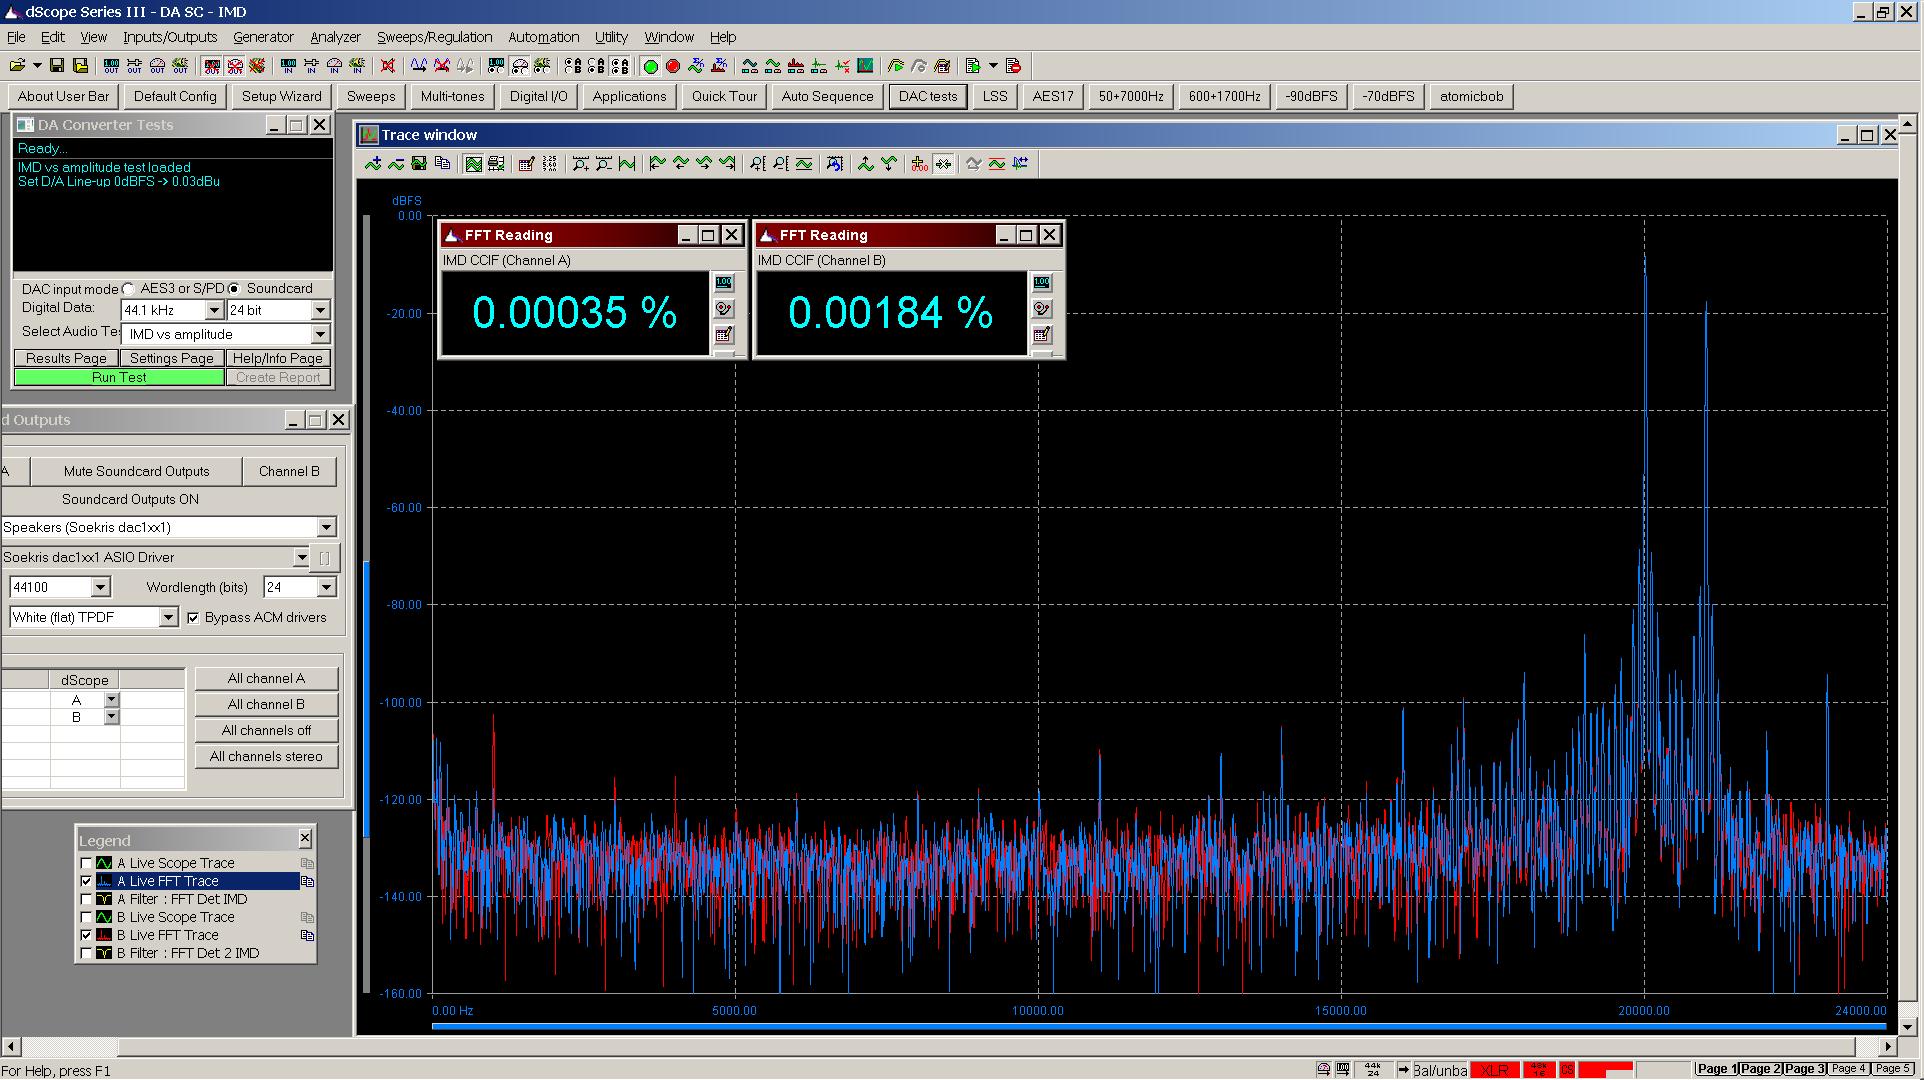 08 Bal IMD spectrum 300R.PNG